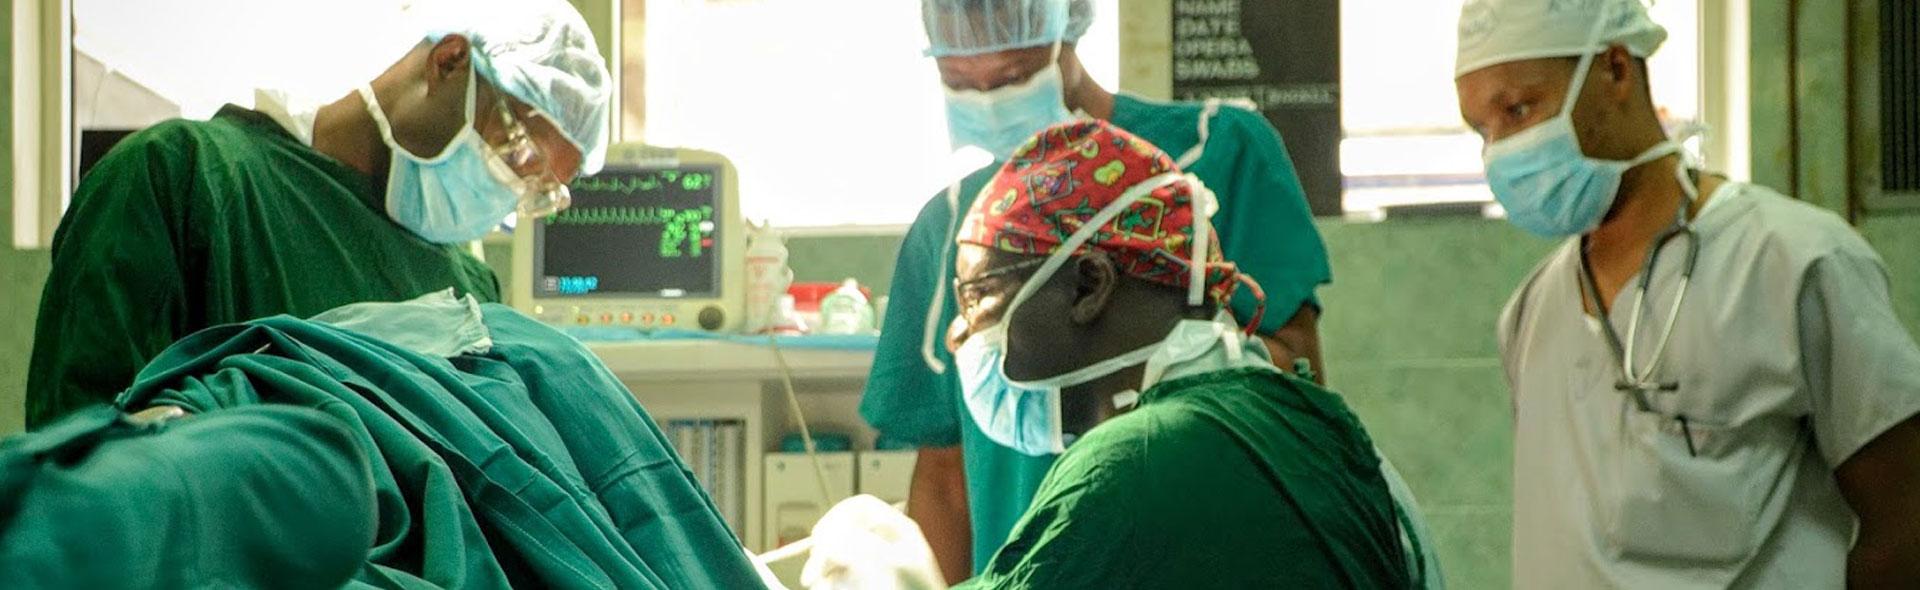 Reconstructive Surgery Africa